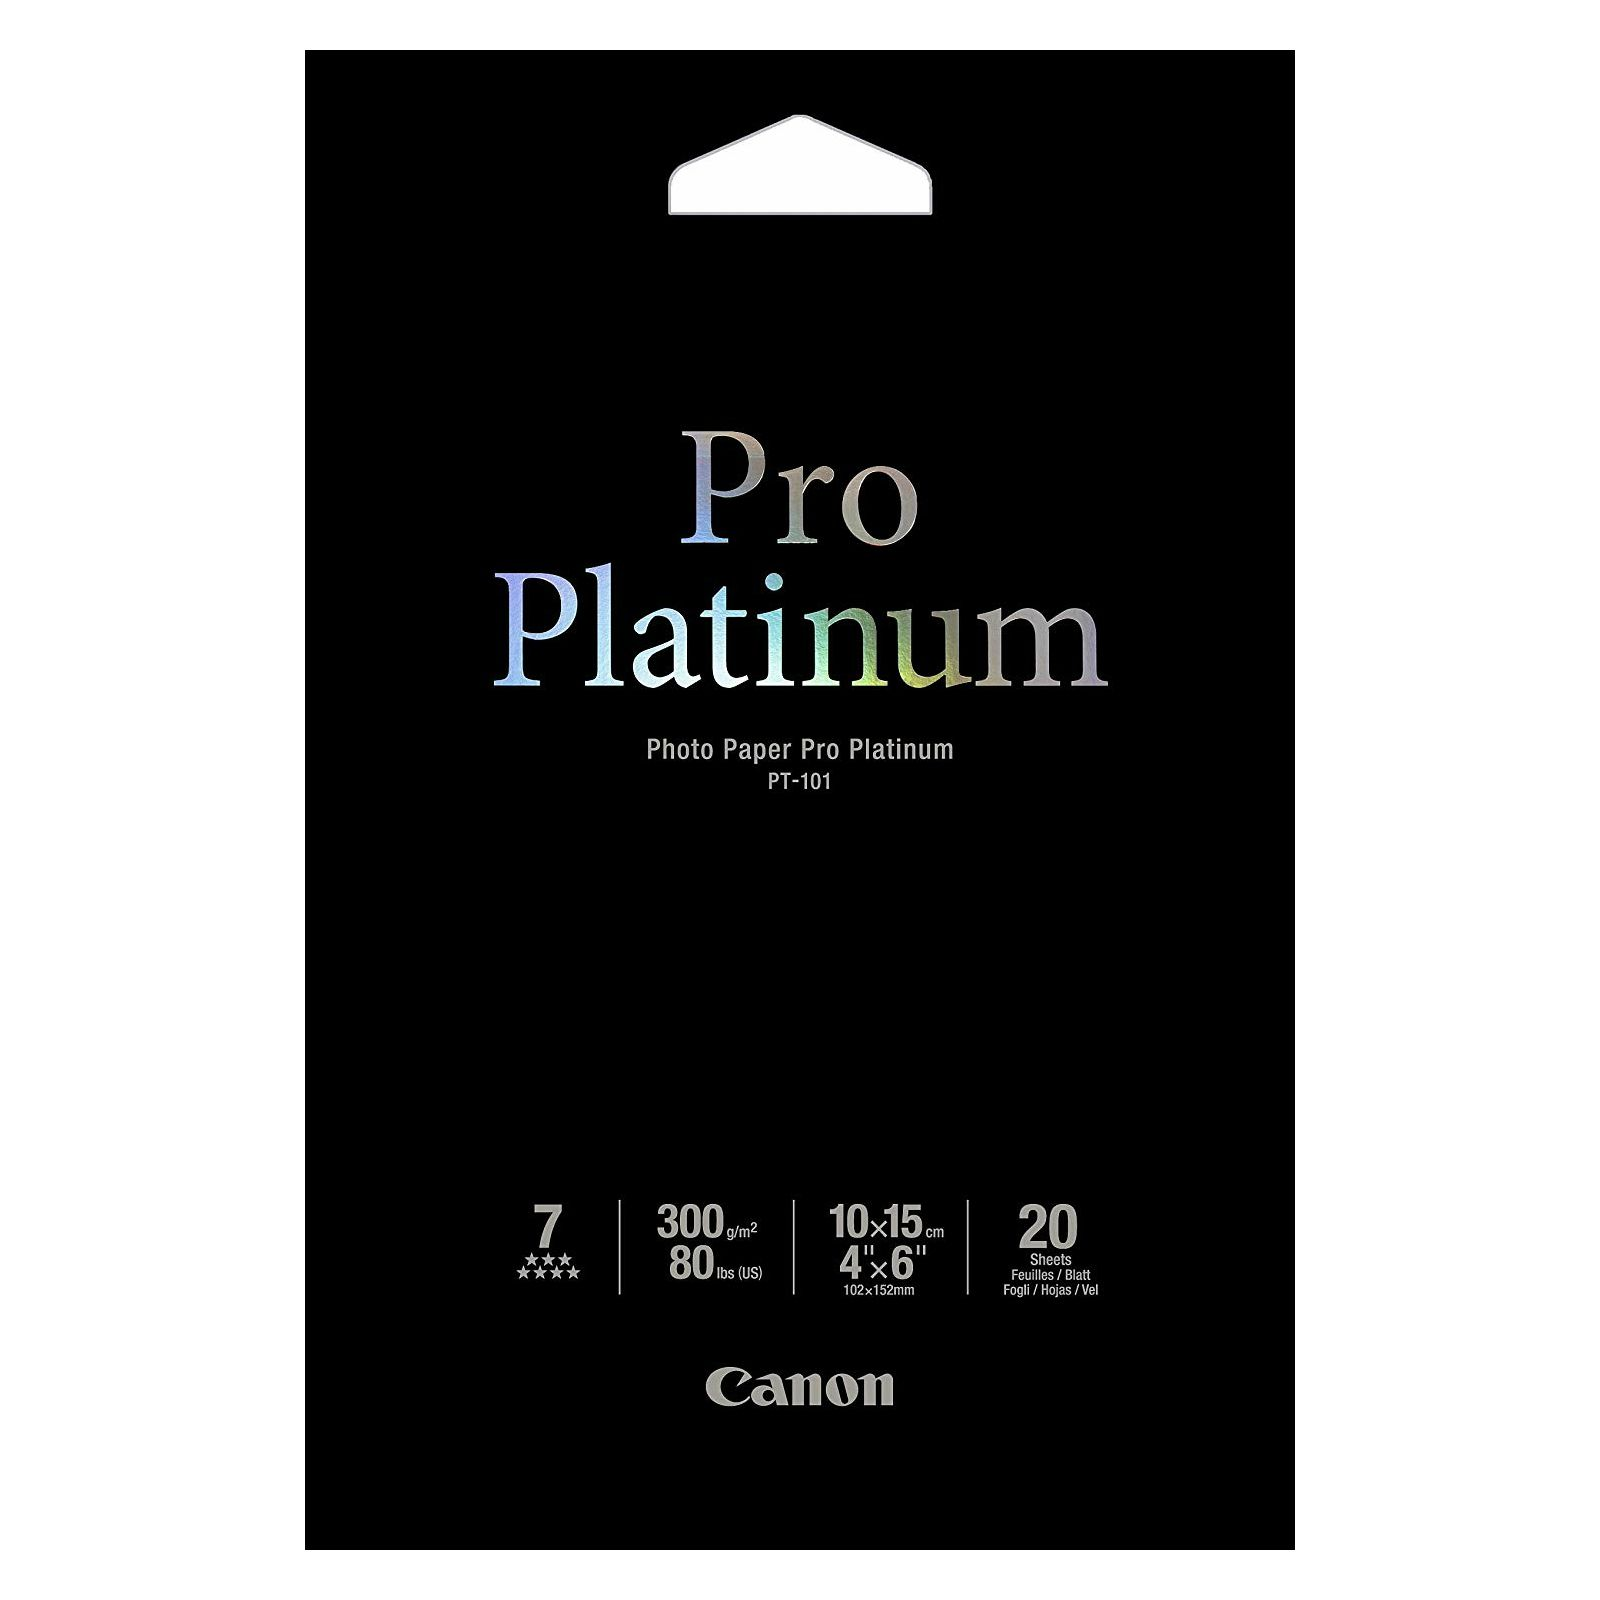 Canon Photo Paper Pro Platinum PT-101 10x15cm 20 listova foto papir za ispis fotografije Smooth gloss 300gsm ISO98 0.3mm 4x6